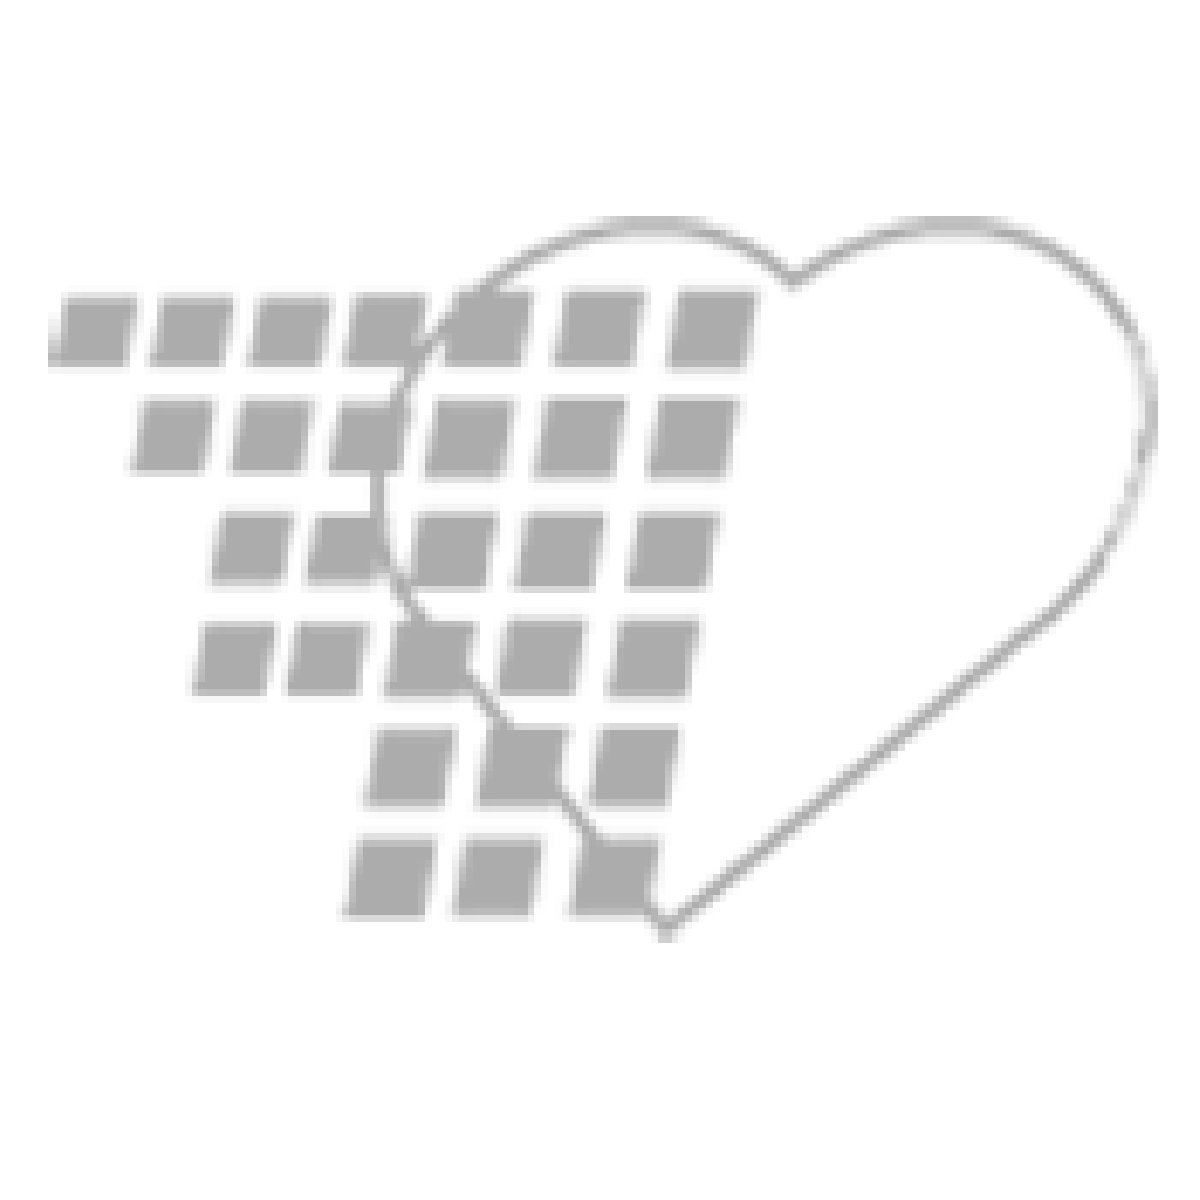 02-70-4070-INFNT - Satin   MacIntosh Blade